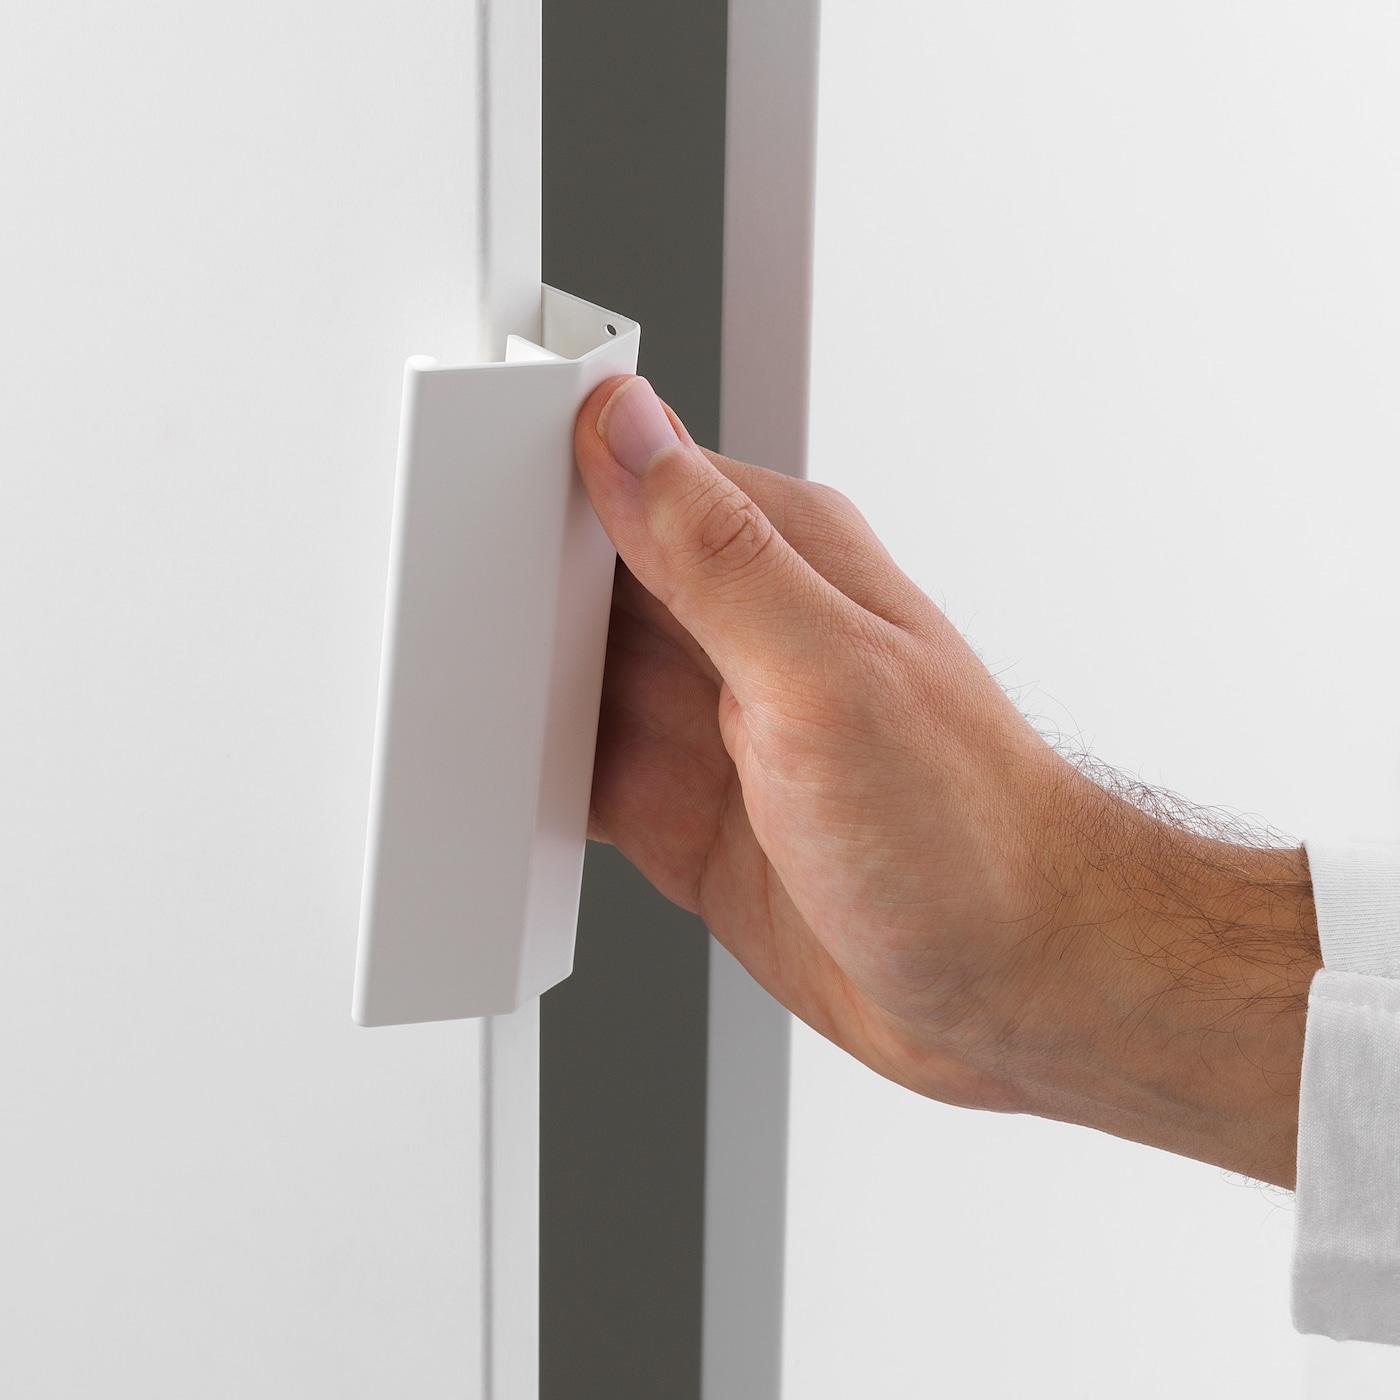 Latthet Griff Weiss Ikea Deutschland